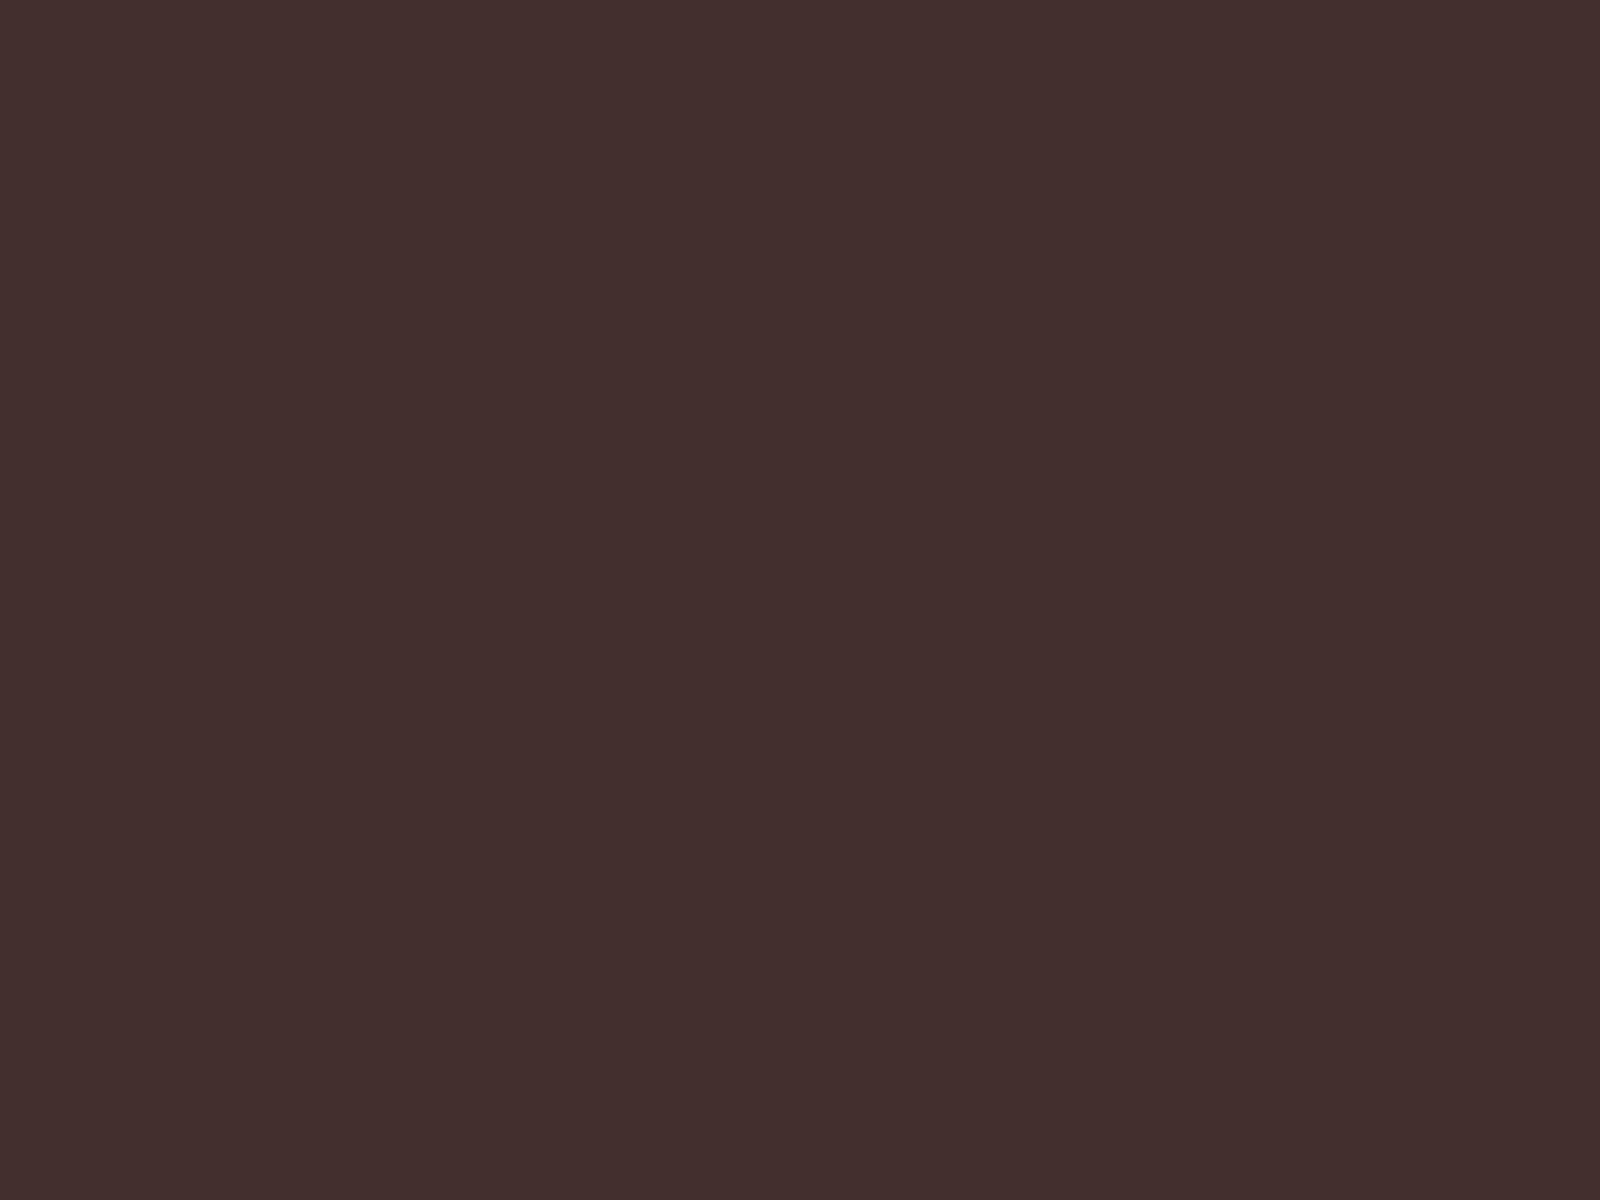 1600x1200 Old Burgundy Solid Color Background